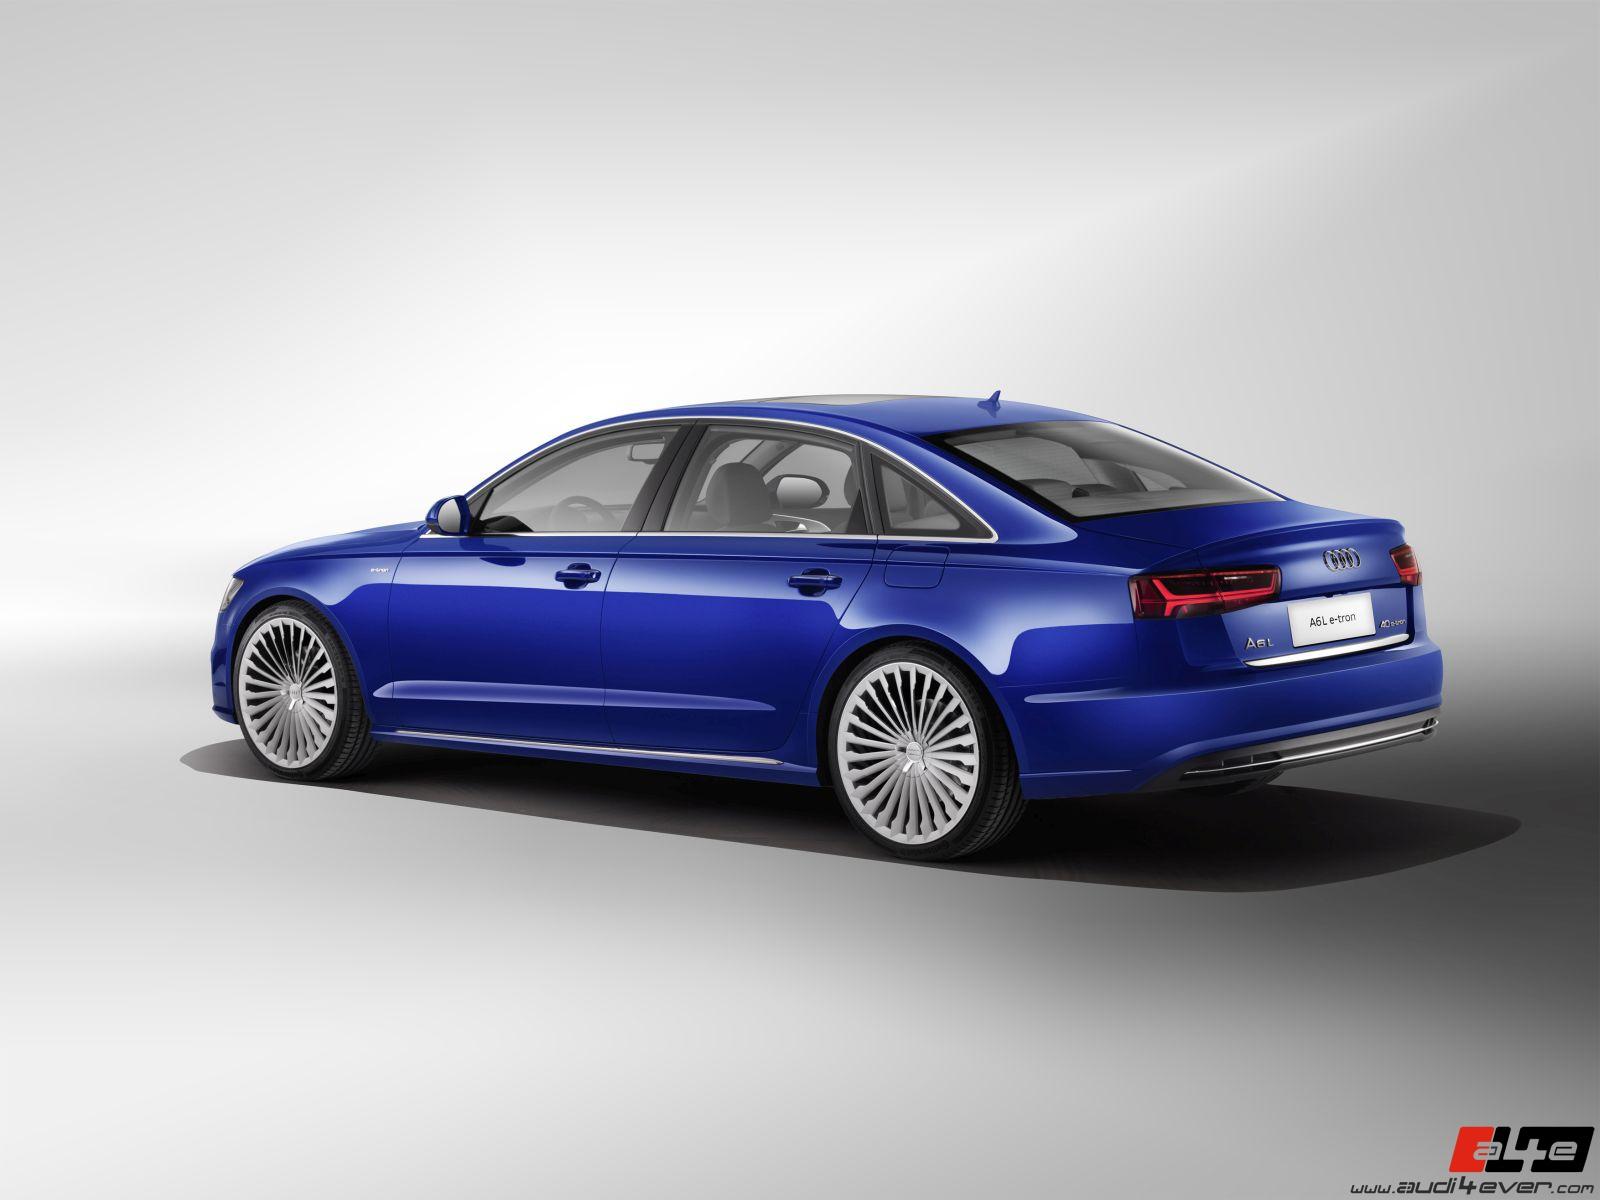 a4e - Gallery Audi A6 [C7] - Audi A6 C7 e-tron China